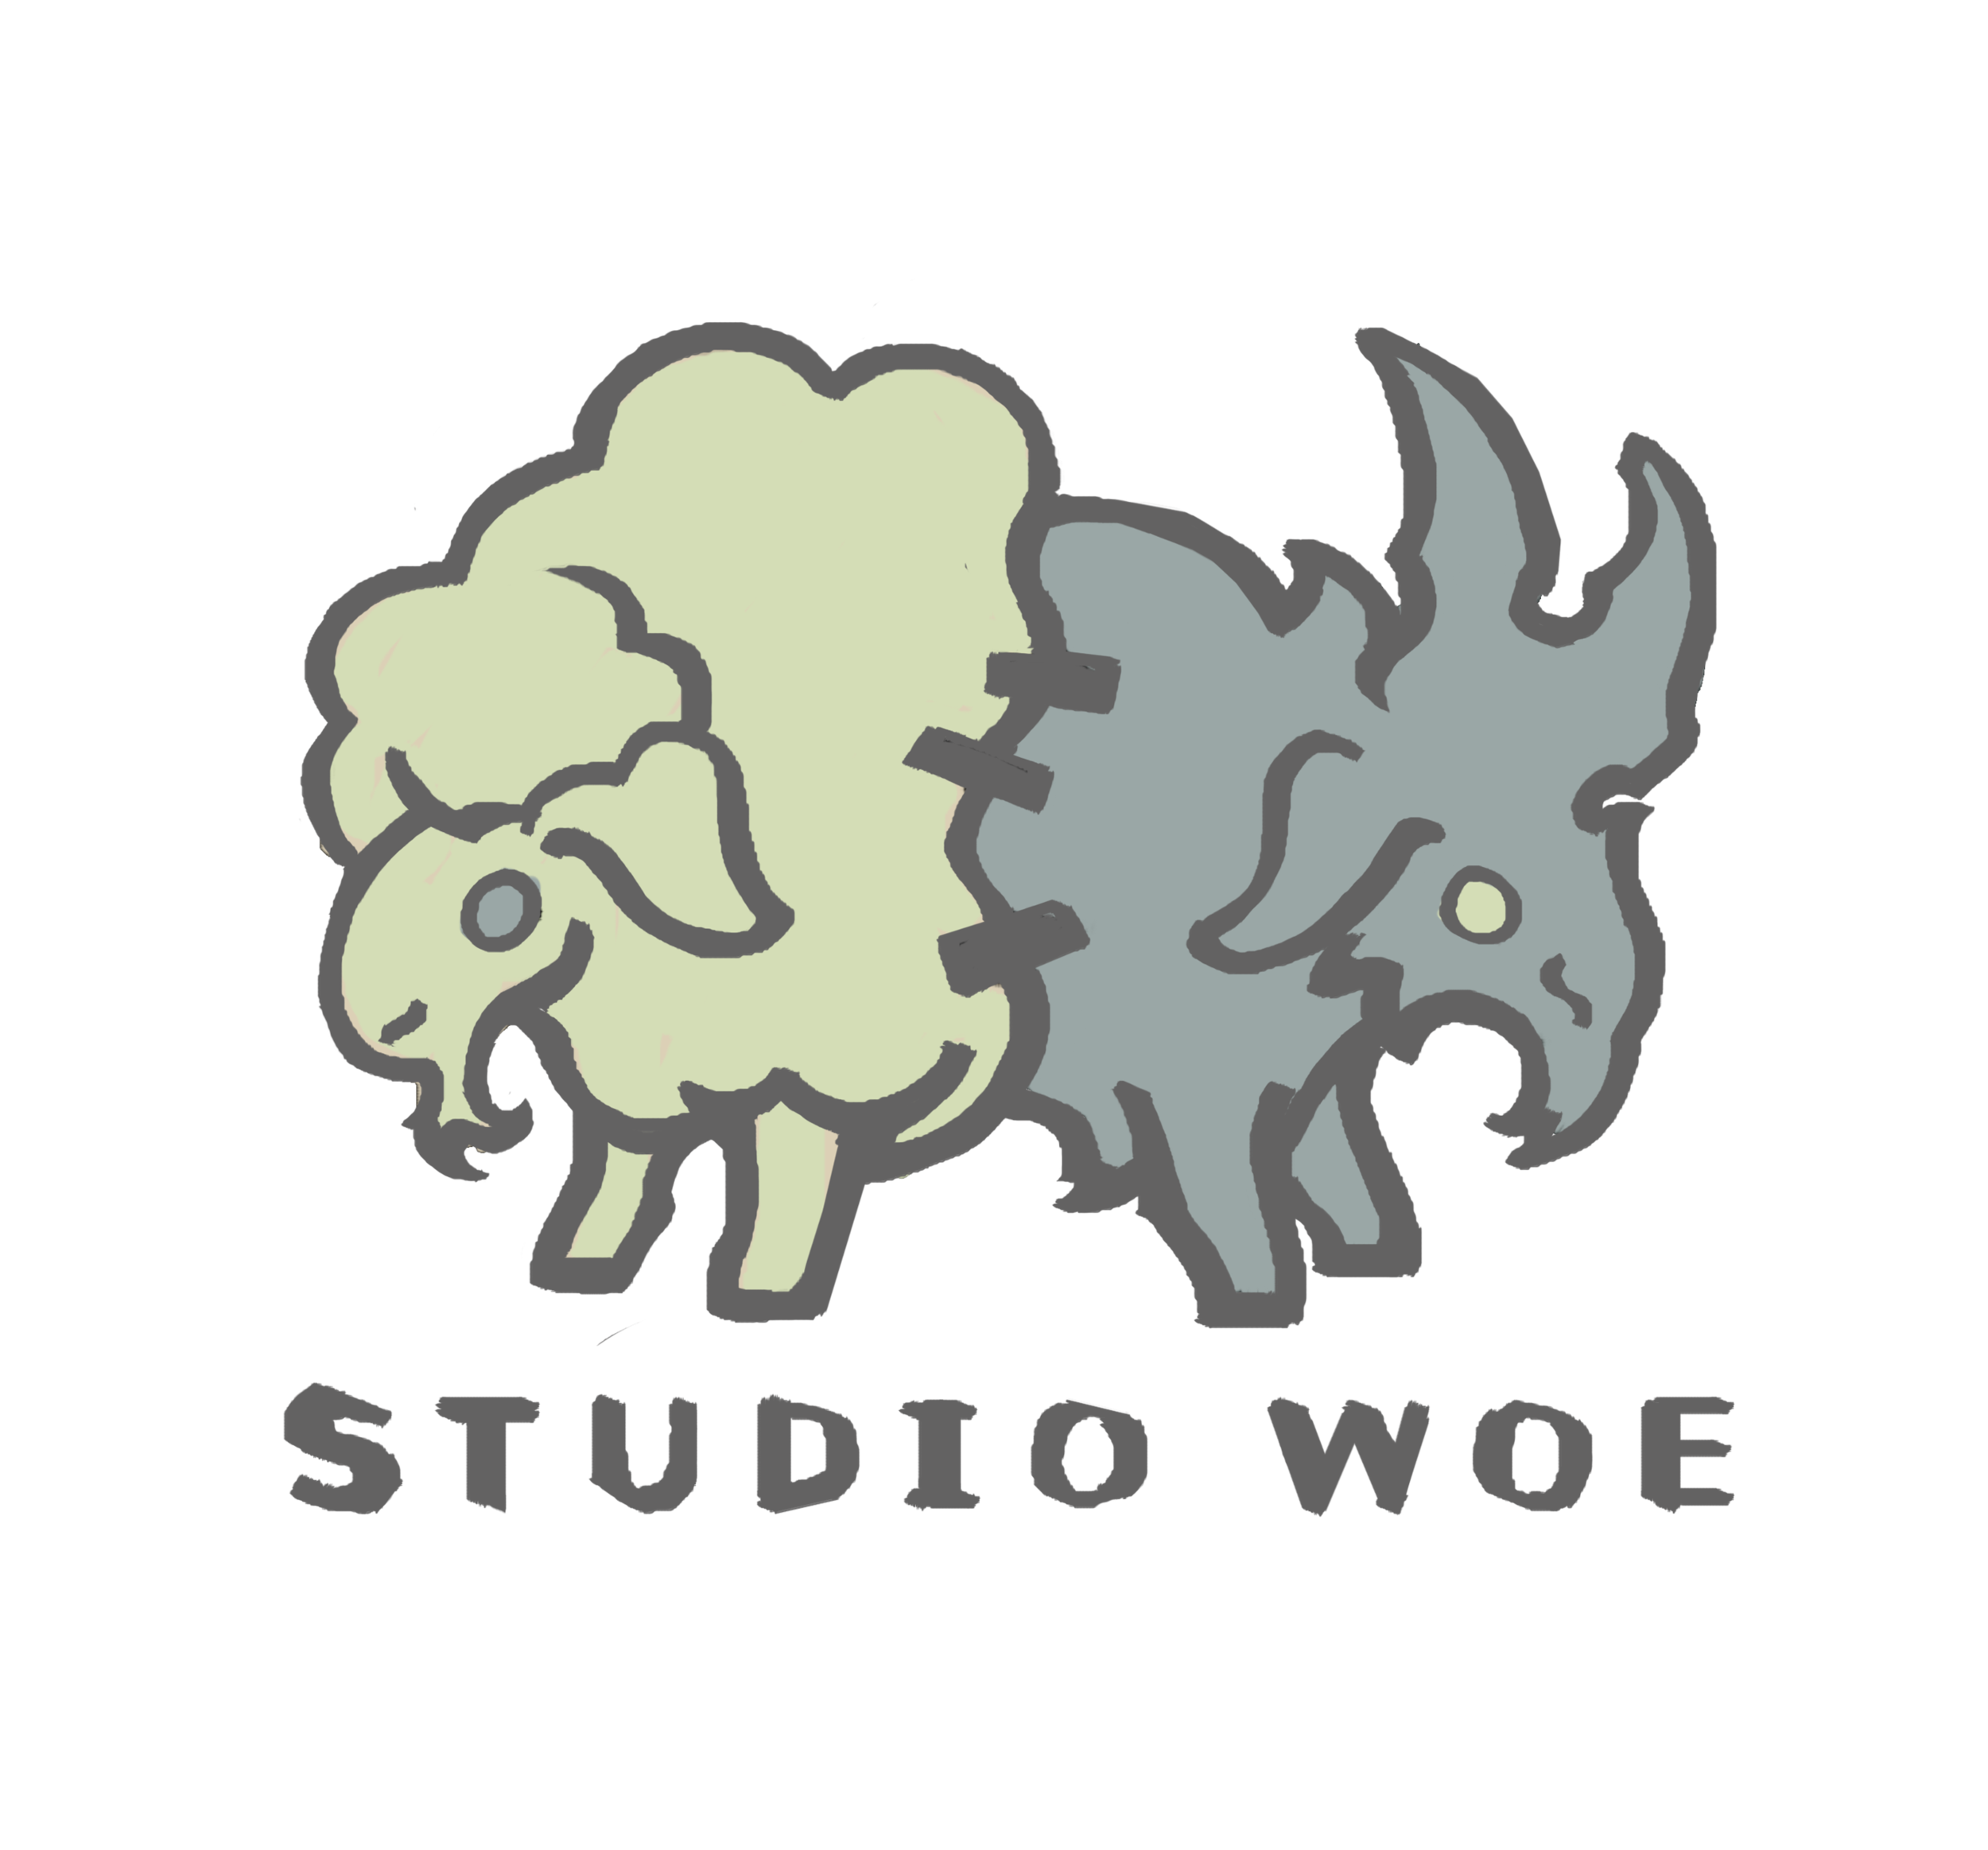 StudioWoe_Final - Brent Critchfield (1).png